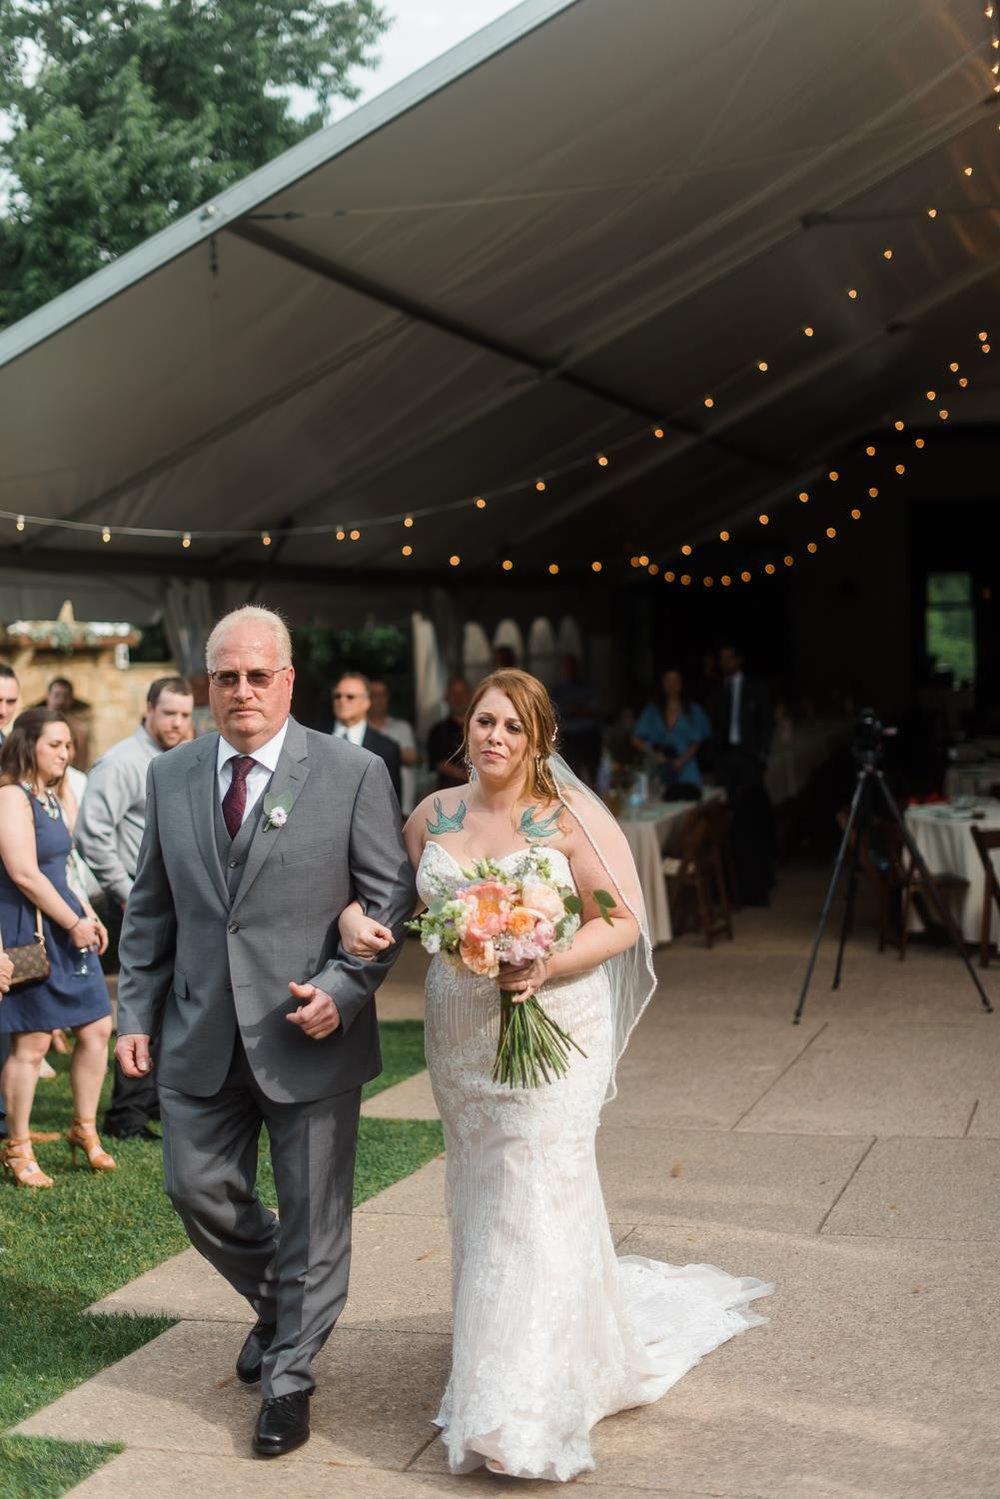 pittsburgh-botanic-garden-wedding-rustic-romantic-pennsylvania-0017.jpg